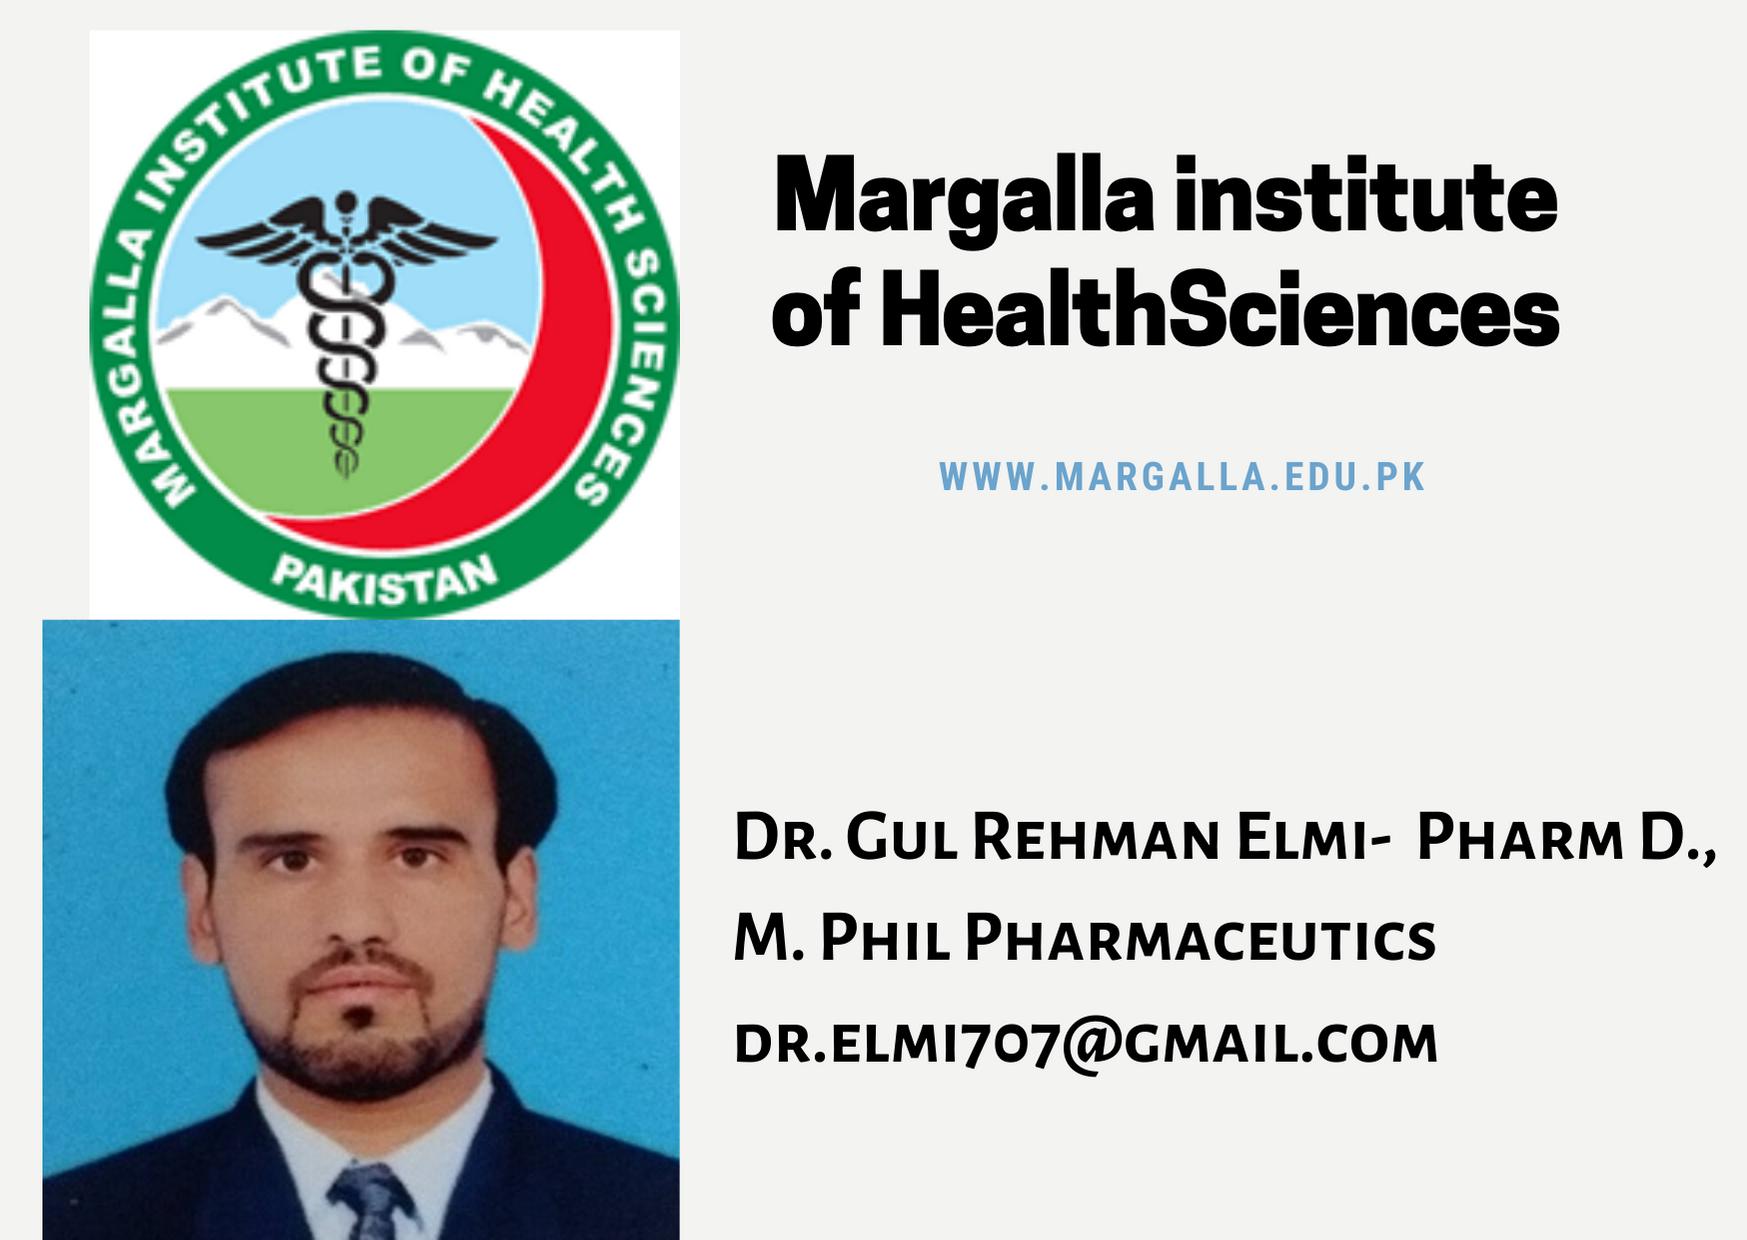 Dr. Gul Rehman Elmi talking about MIHS